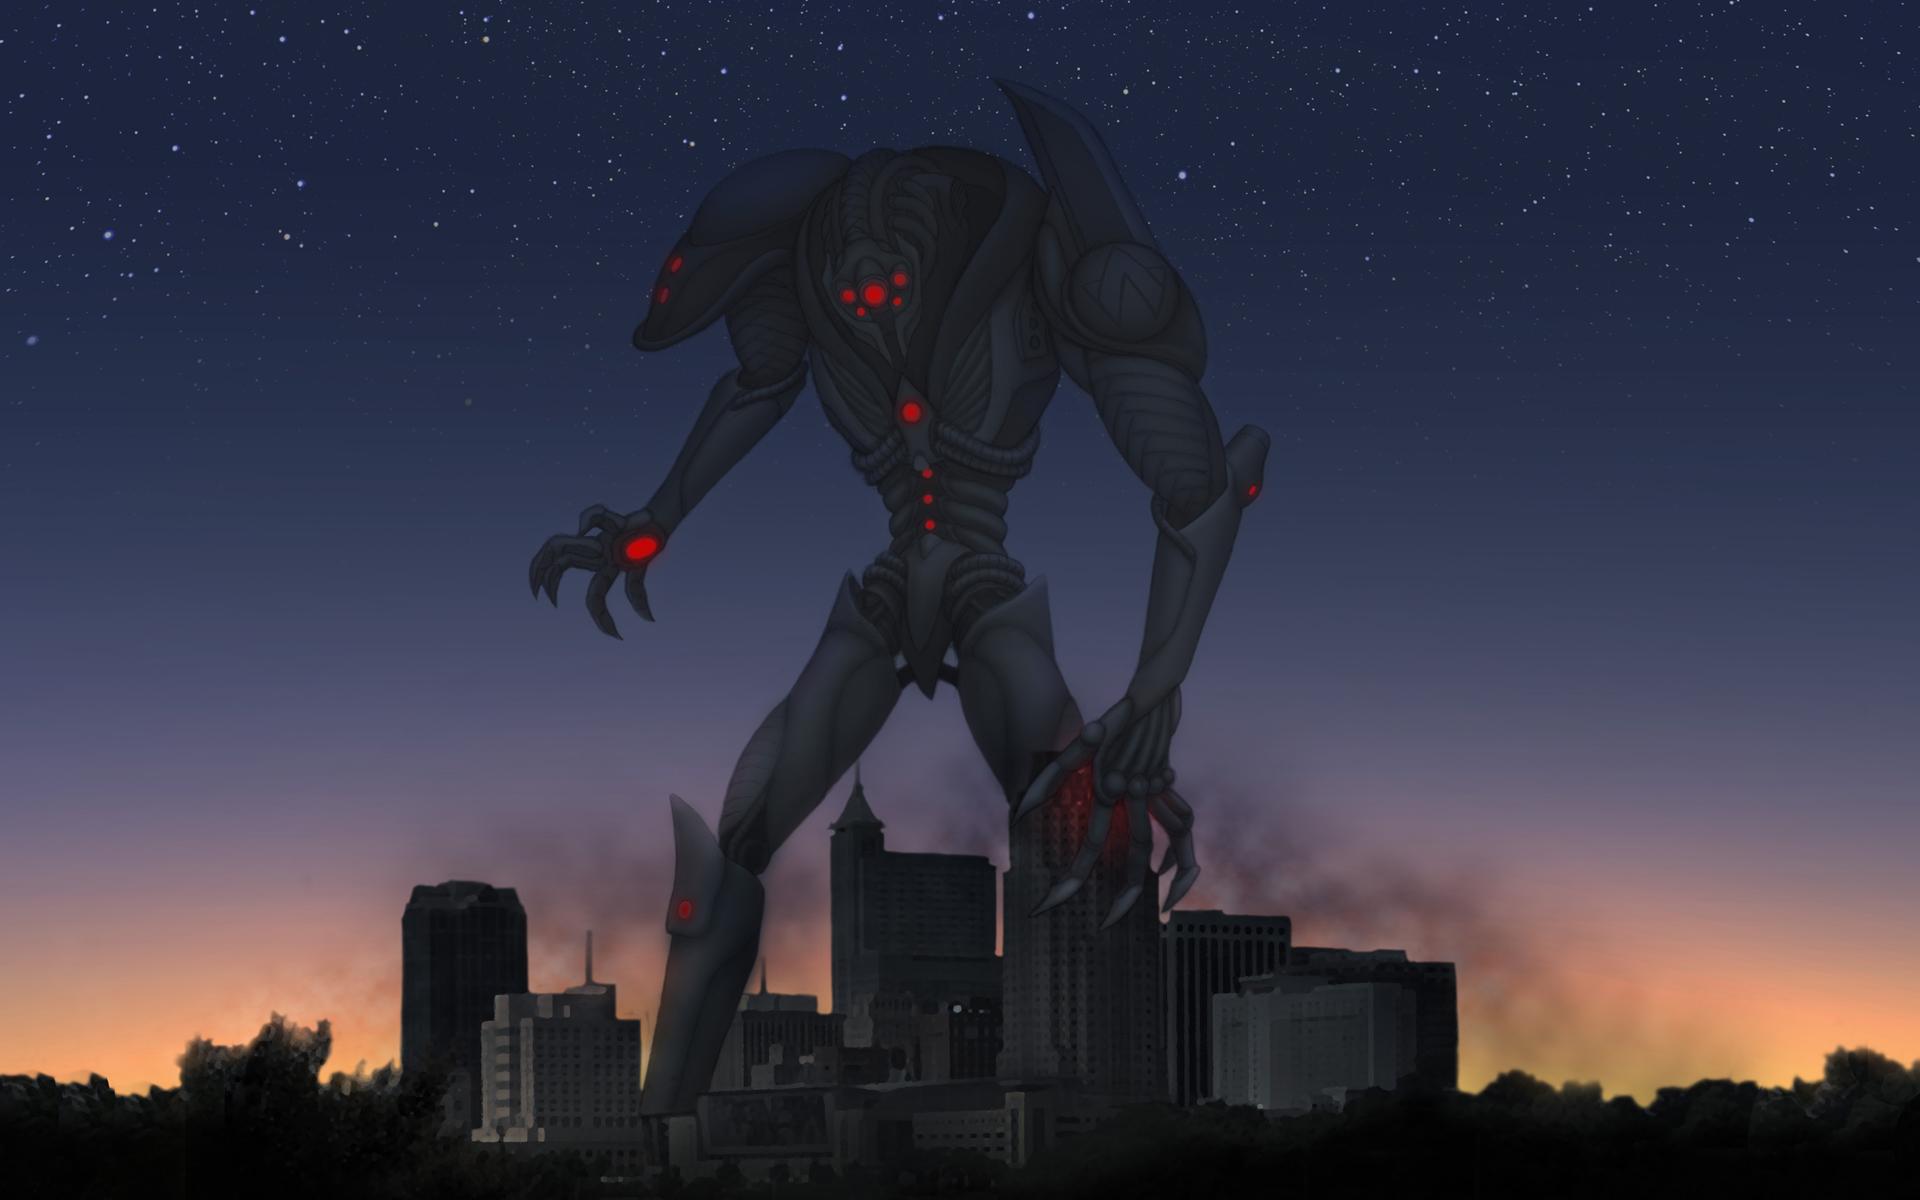 Giant Robot Apocalypse